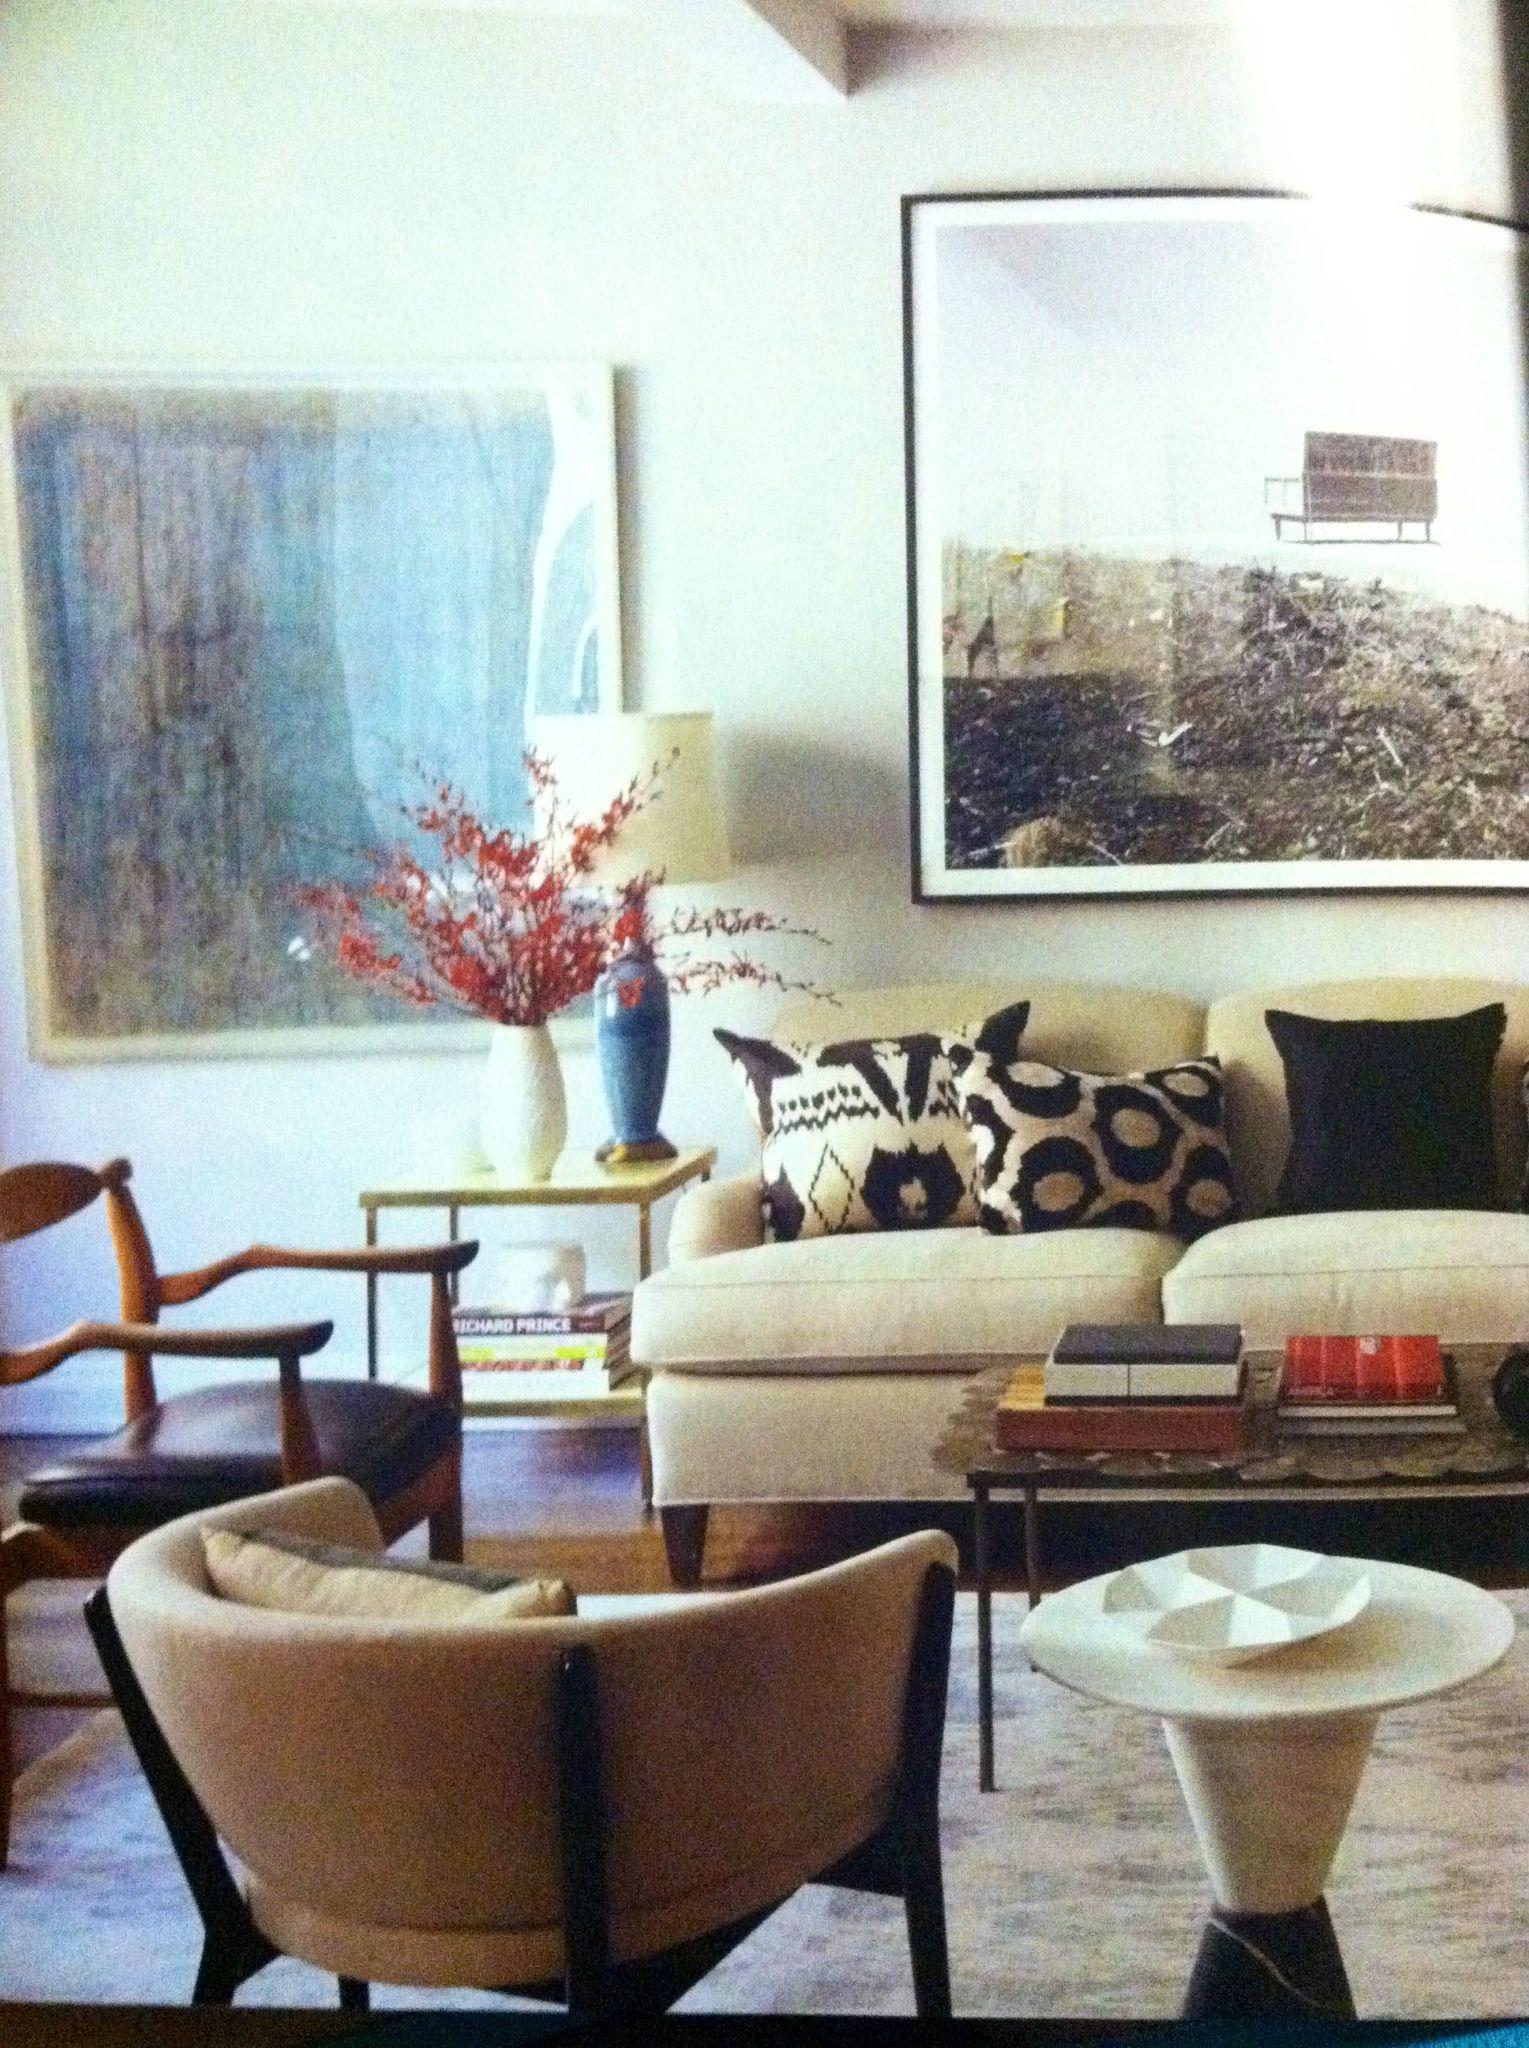 Couch elle decor interior decorum pinterest for Decor and decorum